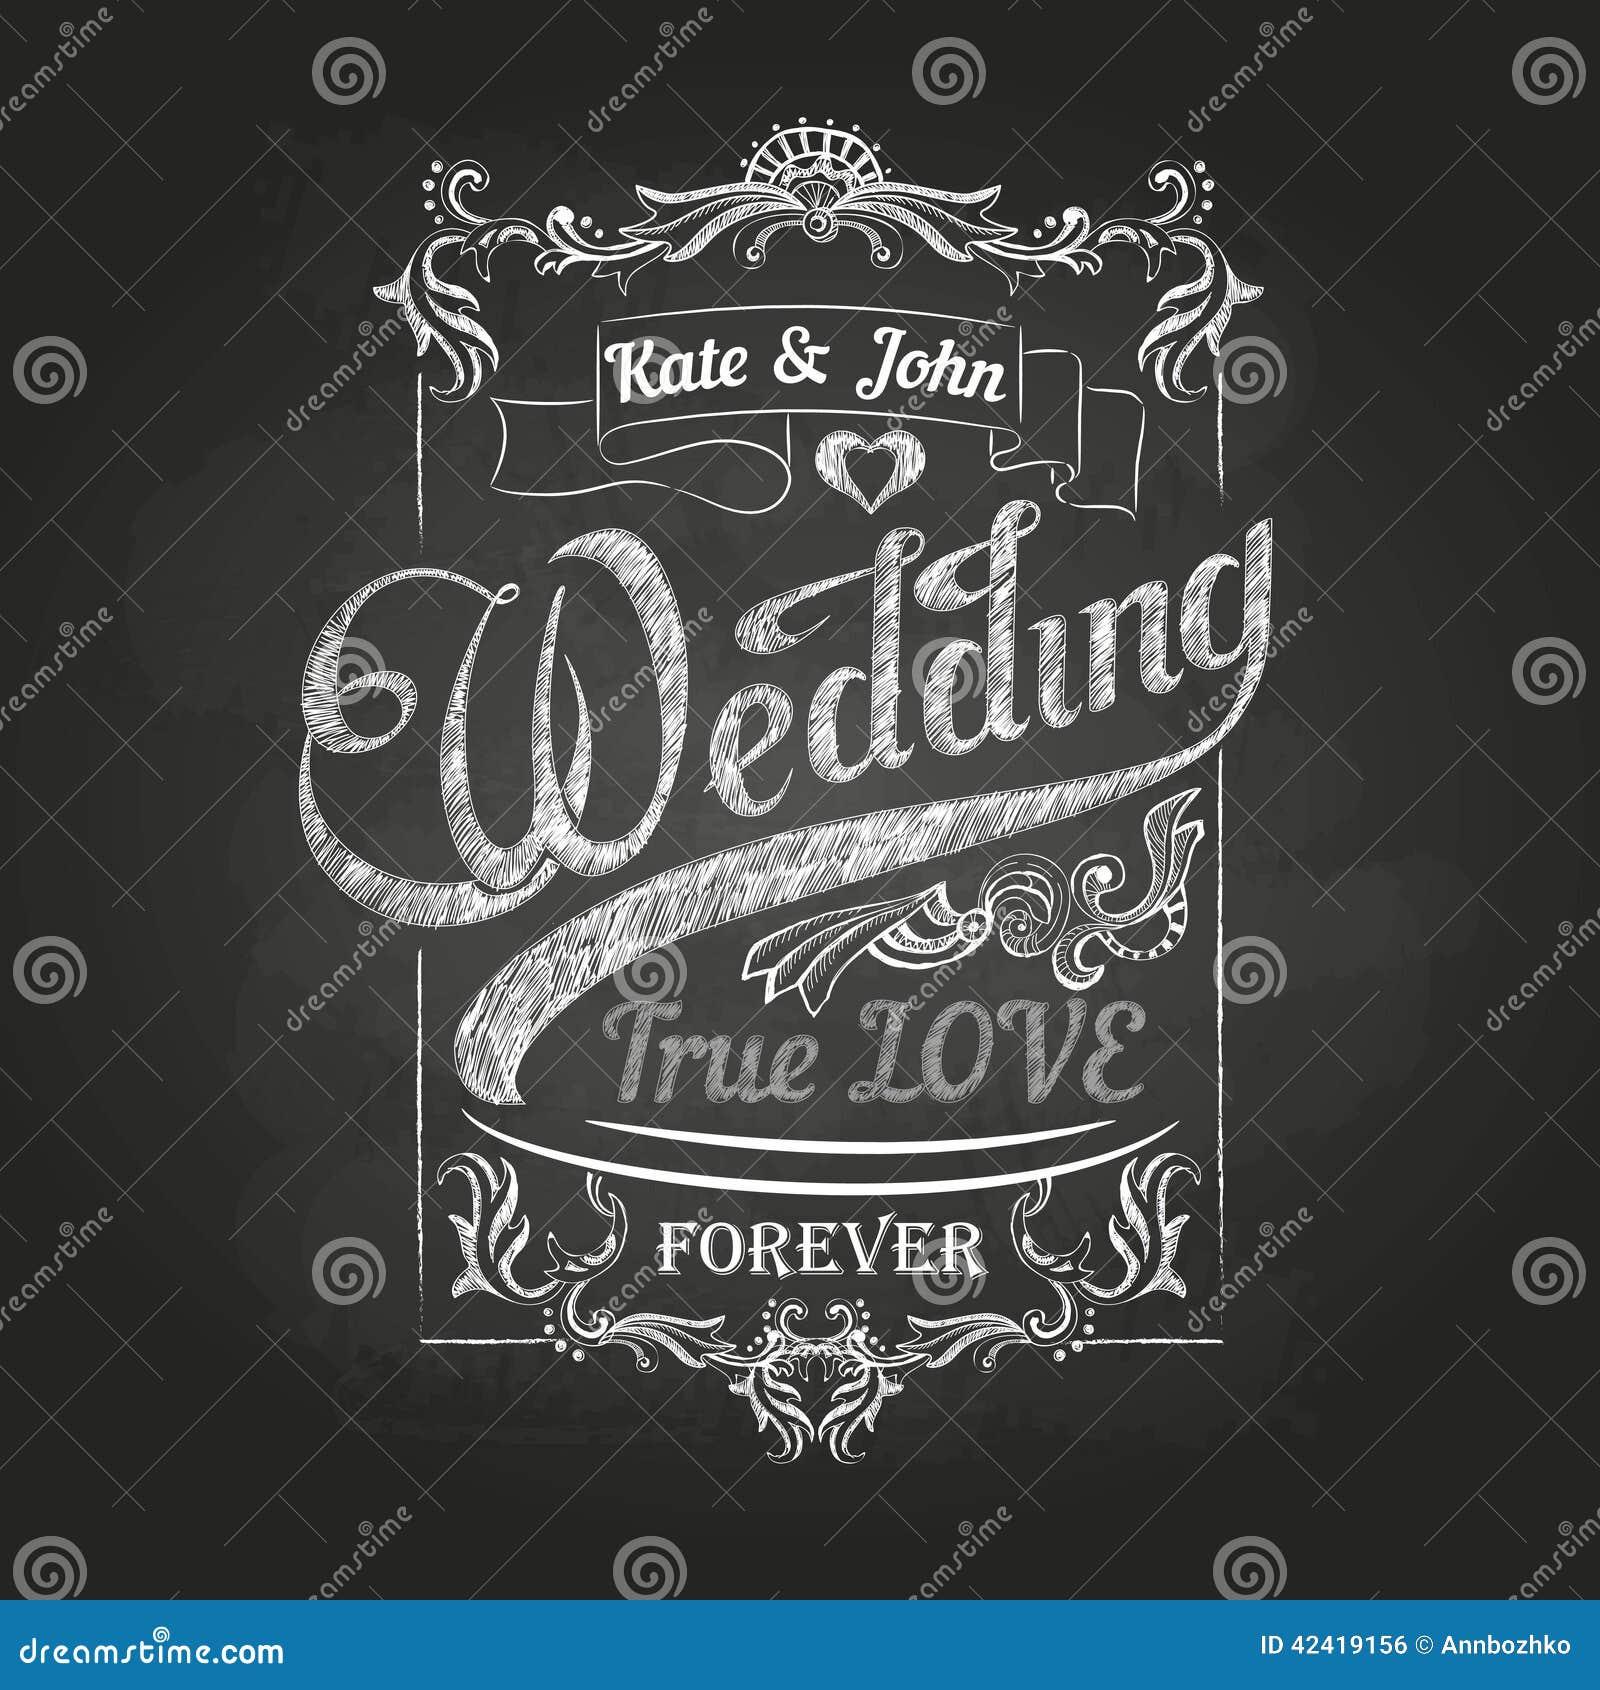 Map For Wedding Invitation with adorable invitation design